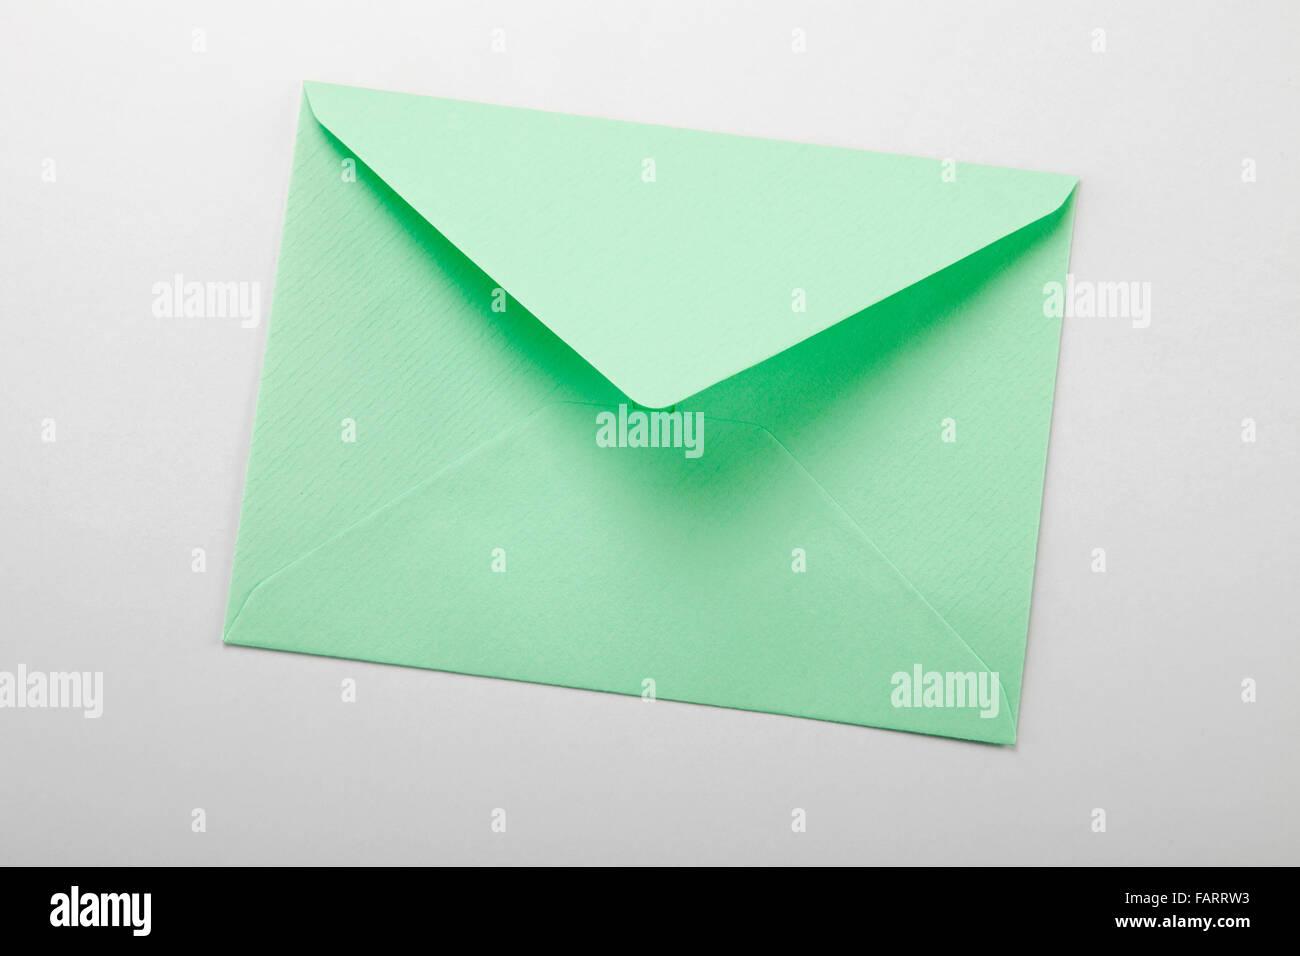 envelope over plain background - Stock Image